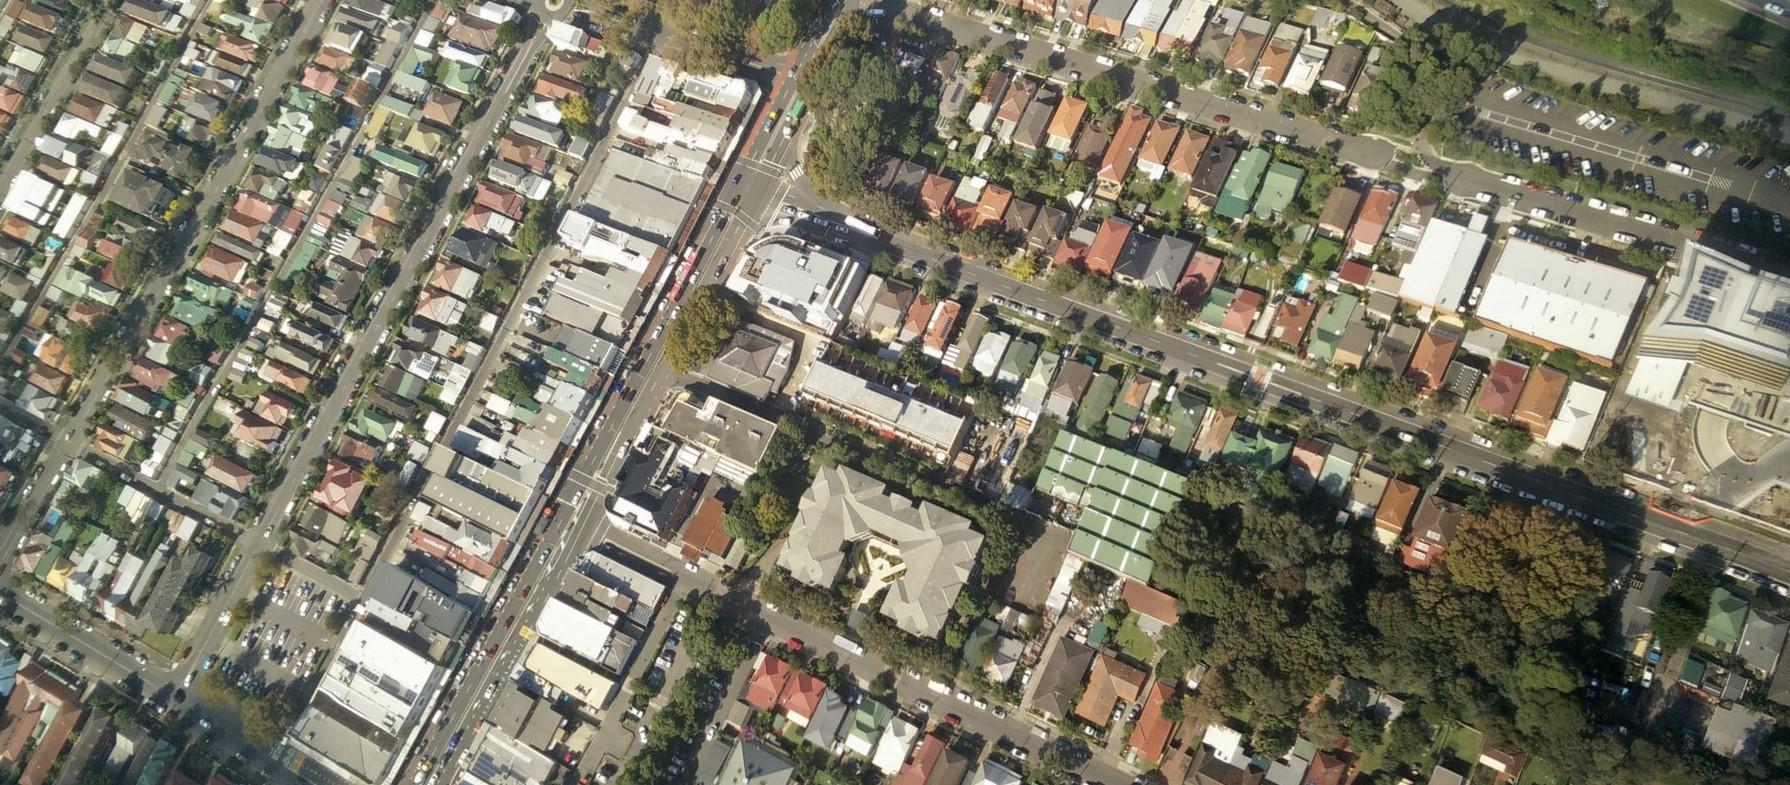 A suburb of Sydney, April 2017 (Photo: Flickr/Andrew Harvey)